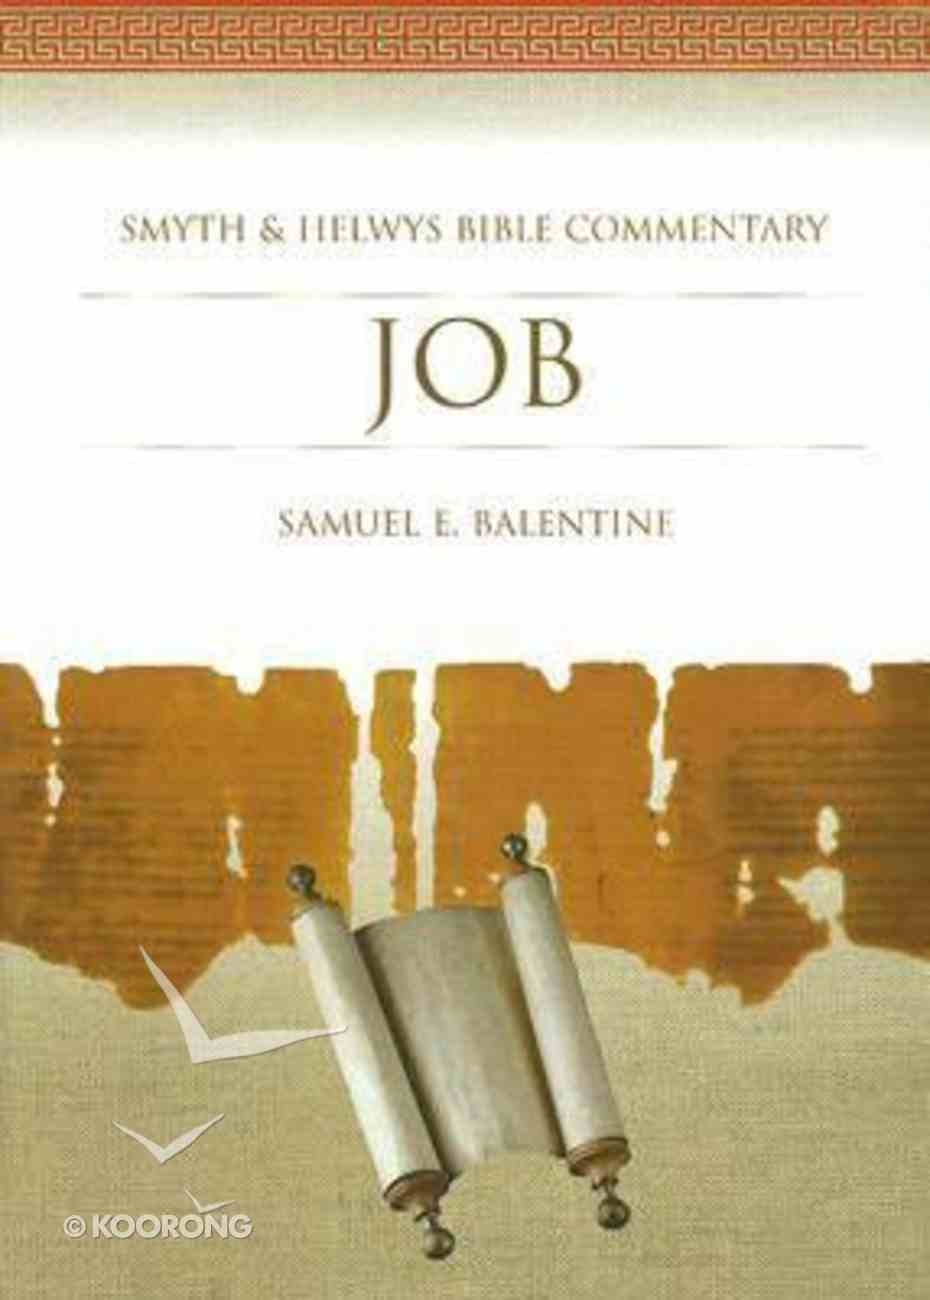 Shbc Bible Commentary: Job (Smyth & Helwys Bible Commentary Series) Hardback